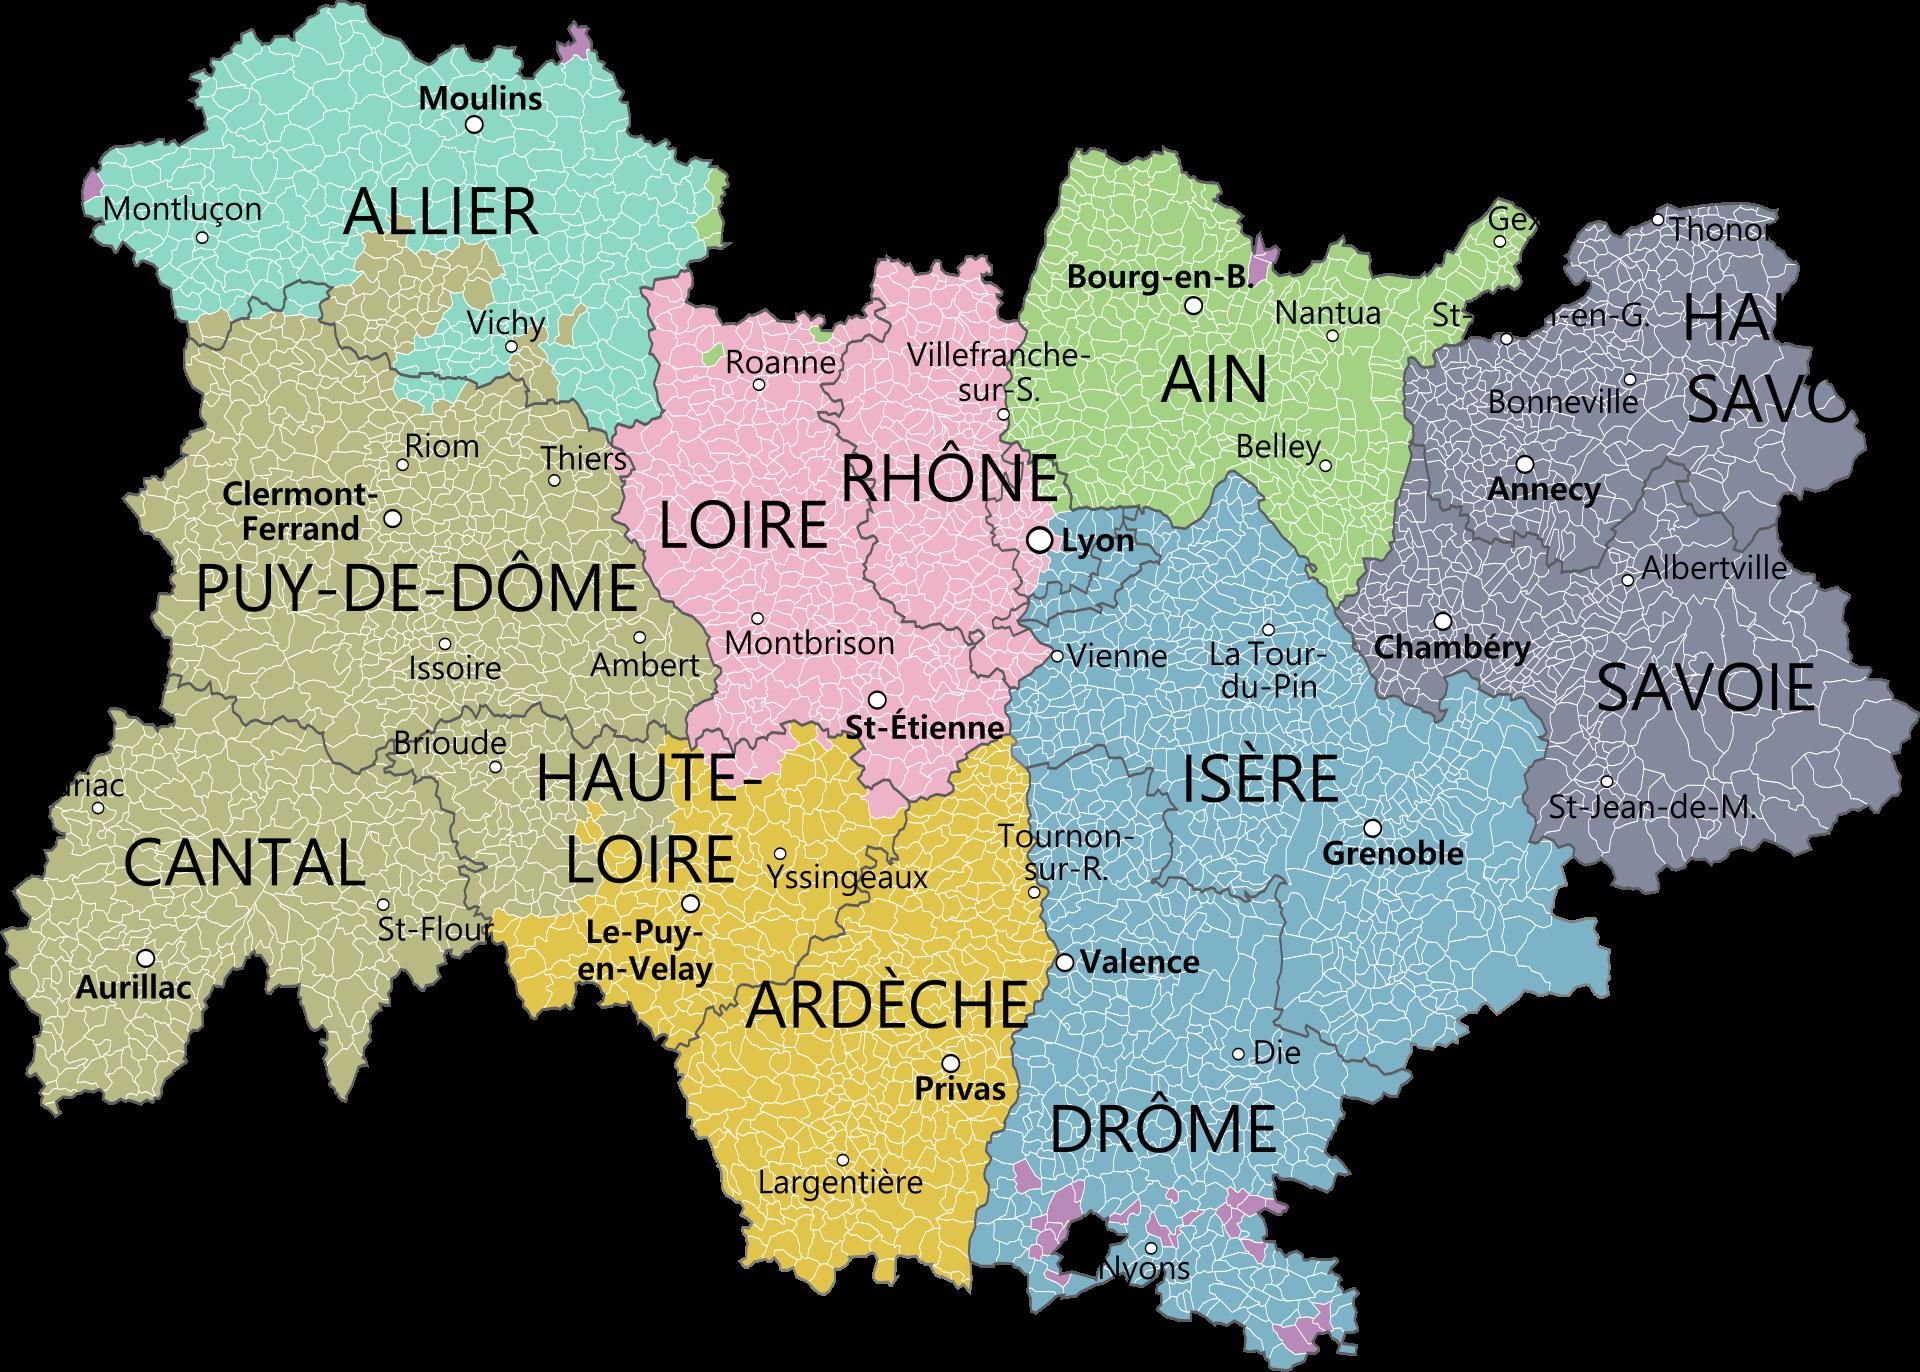 Auvergne Rhone Alpes Auvergne Rhone Rhones Alpes